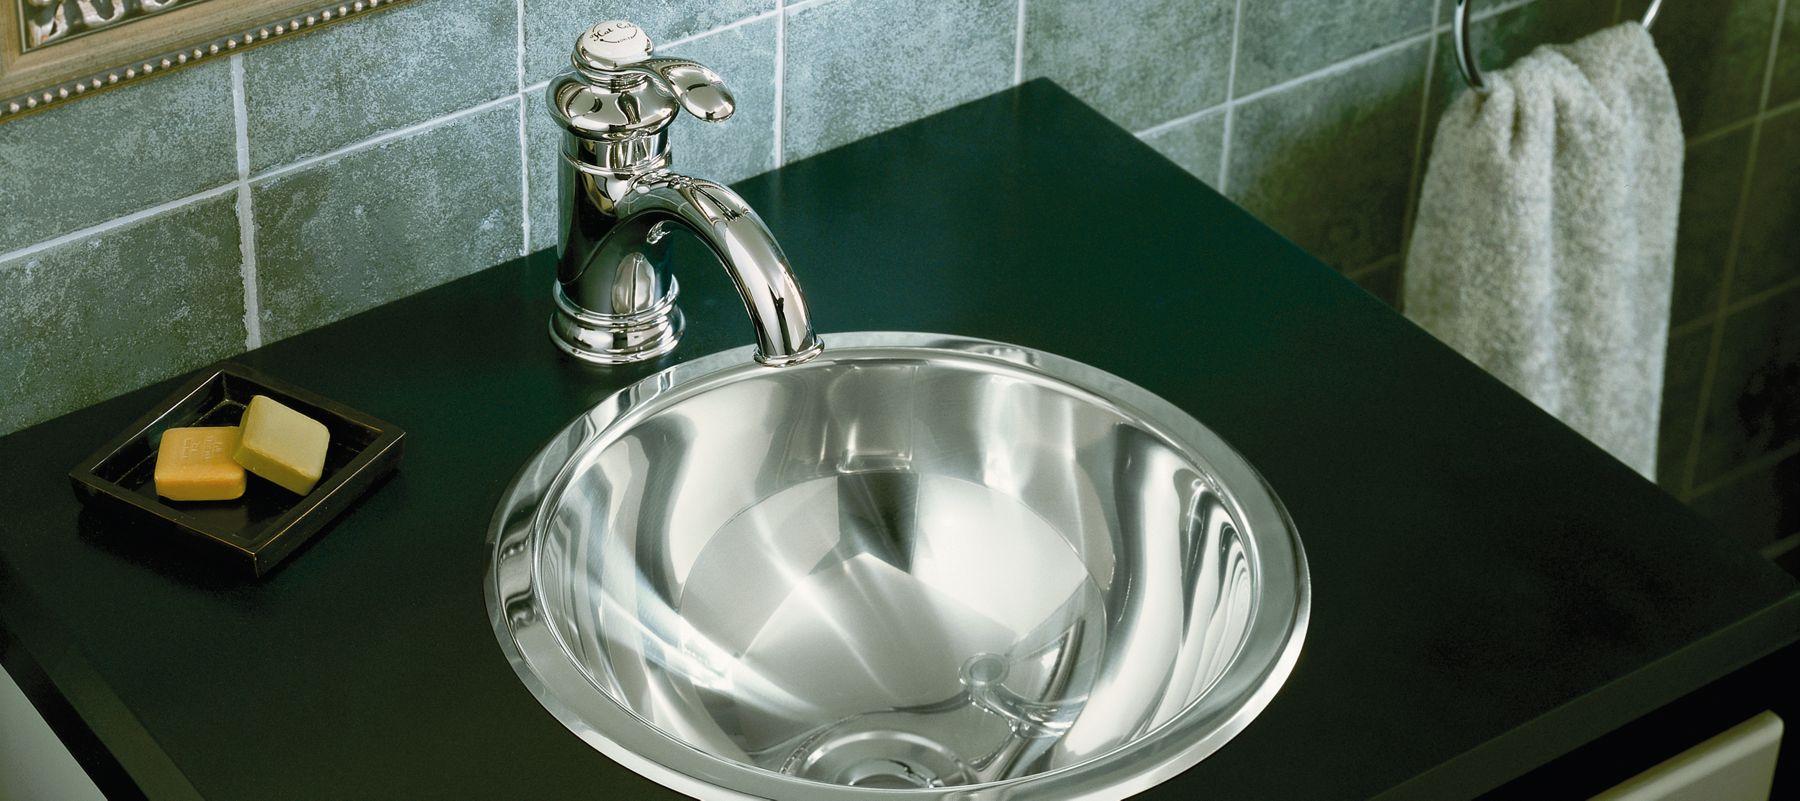 Stainless Steel Bathroom Sinks Bathroom – Stainless Steel Bathroom Sinks